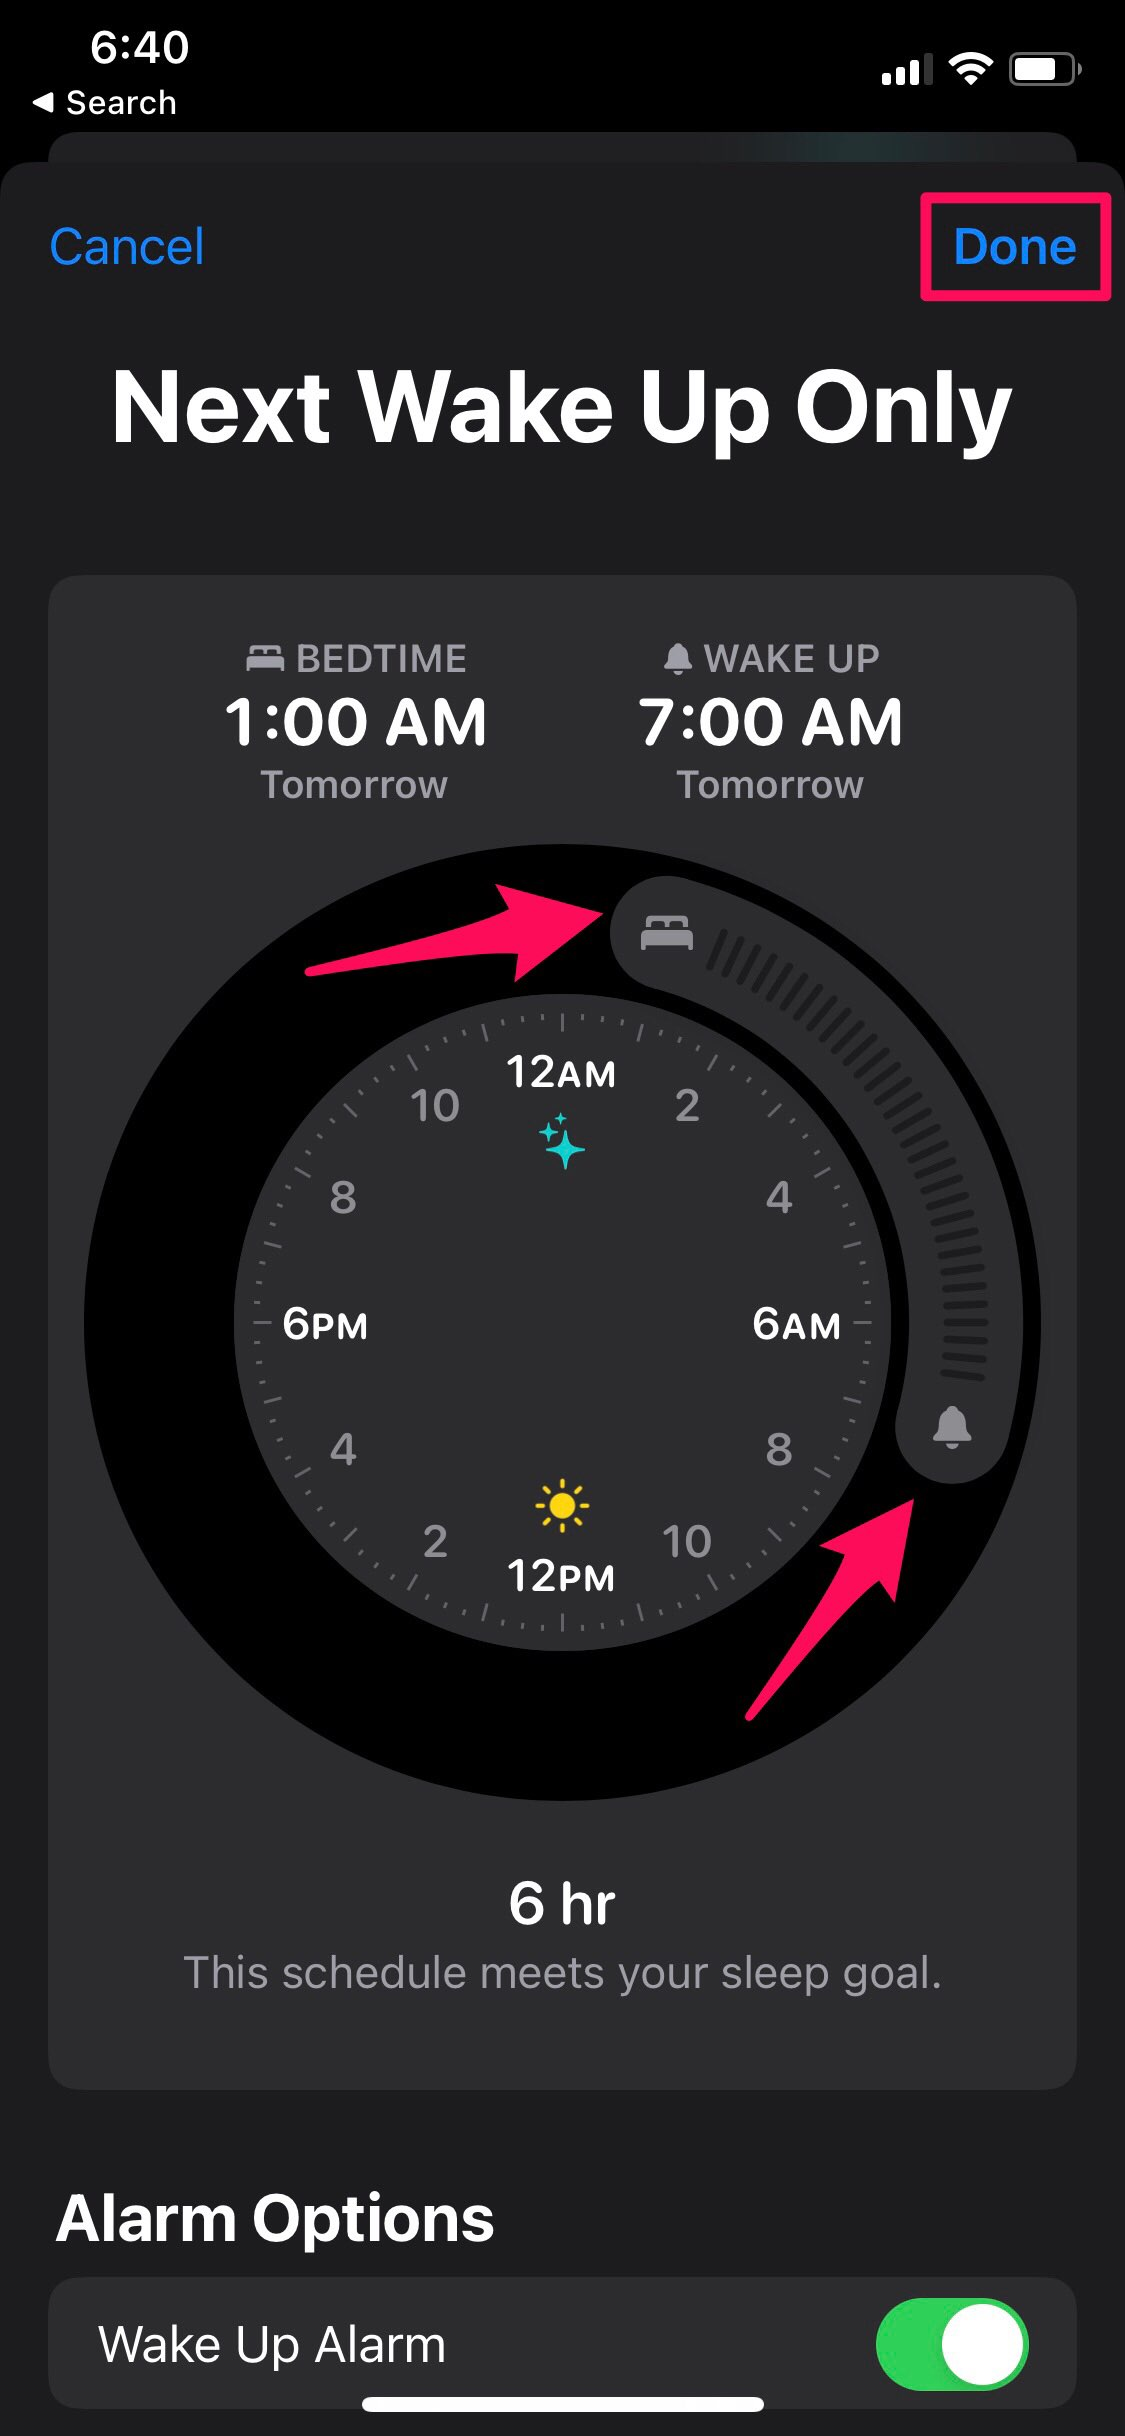 Режим дня. Расписание дня. Режим сна. Мой распорядок дня ...